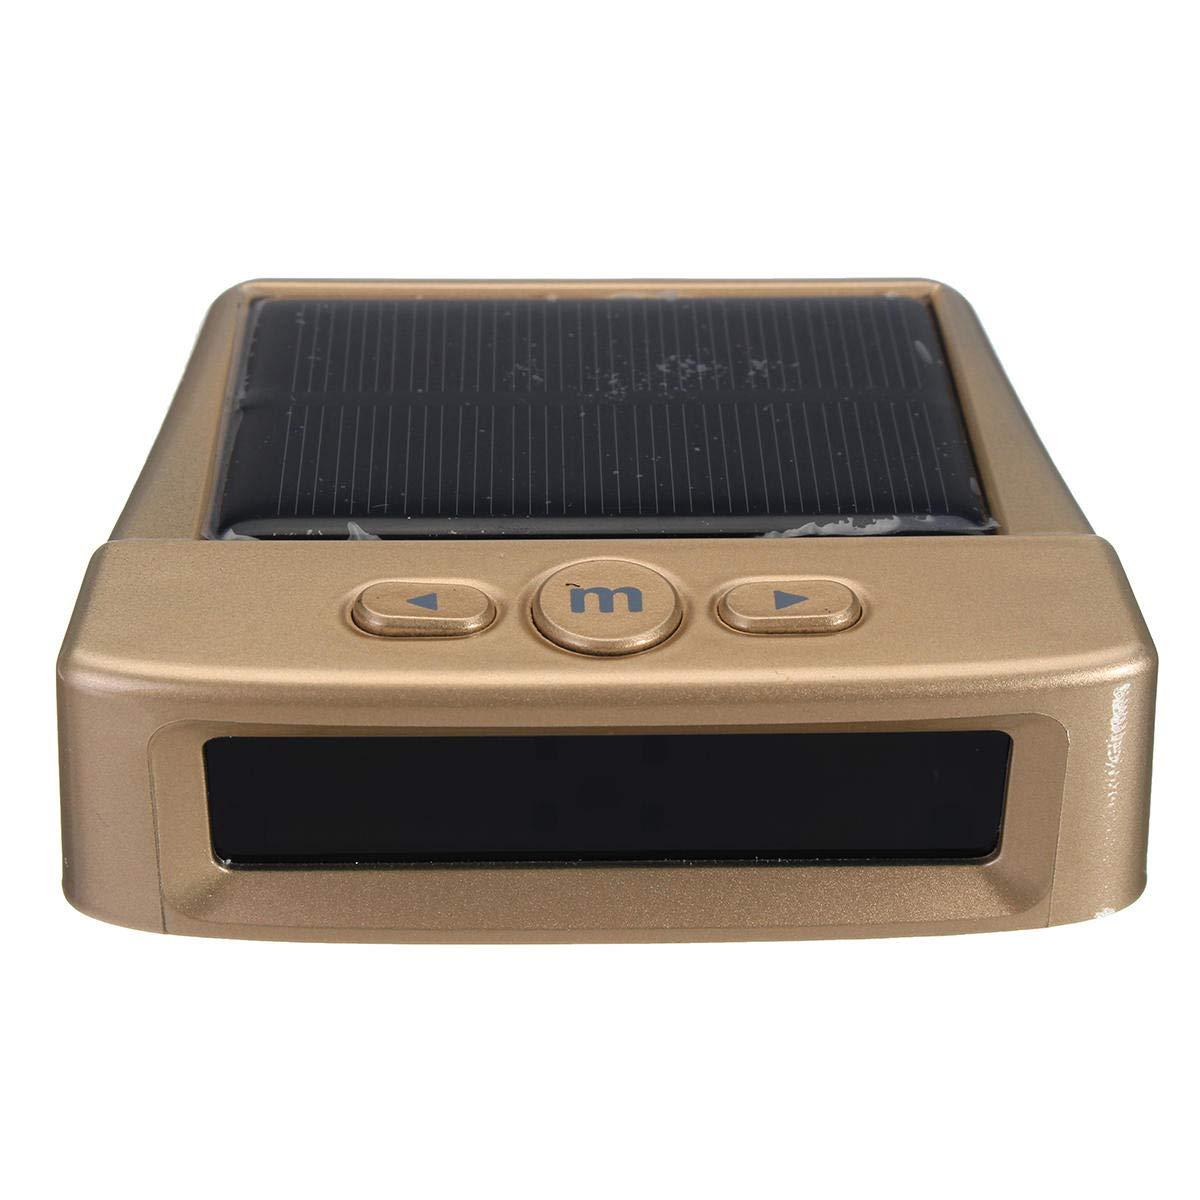 USB/Solar Wireless Car TPMS Tyre Tire Pressure Monitor System+4 External Sensor - Car Electronics Car Electronic Gadgets - (Gold) - 4 X Internal Sensor